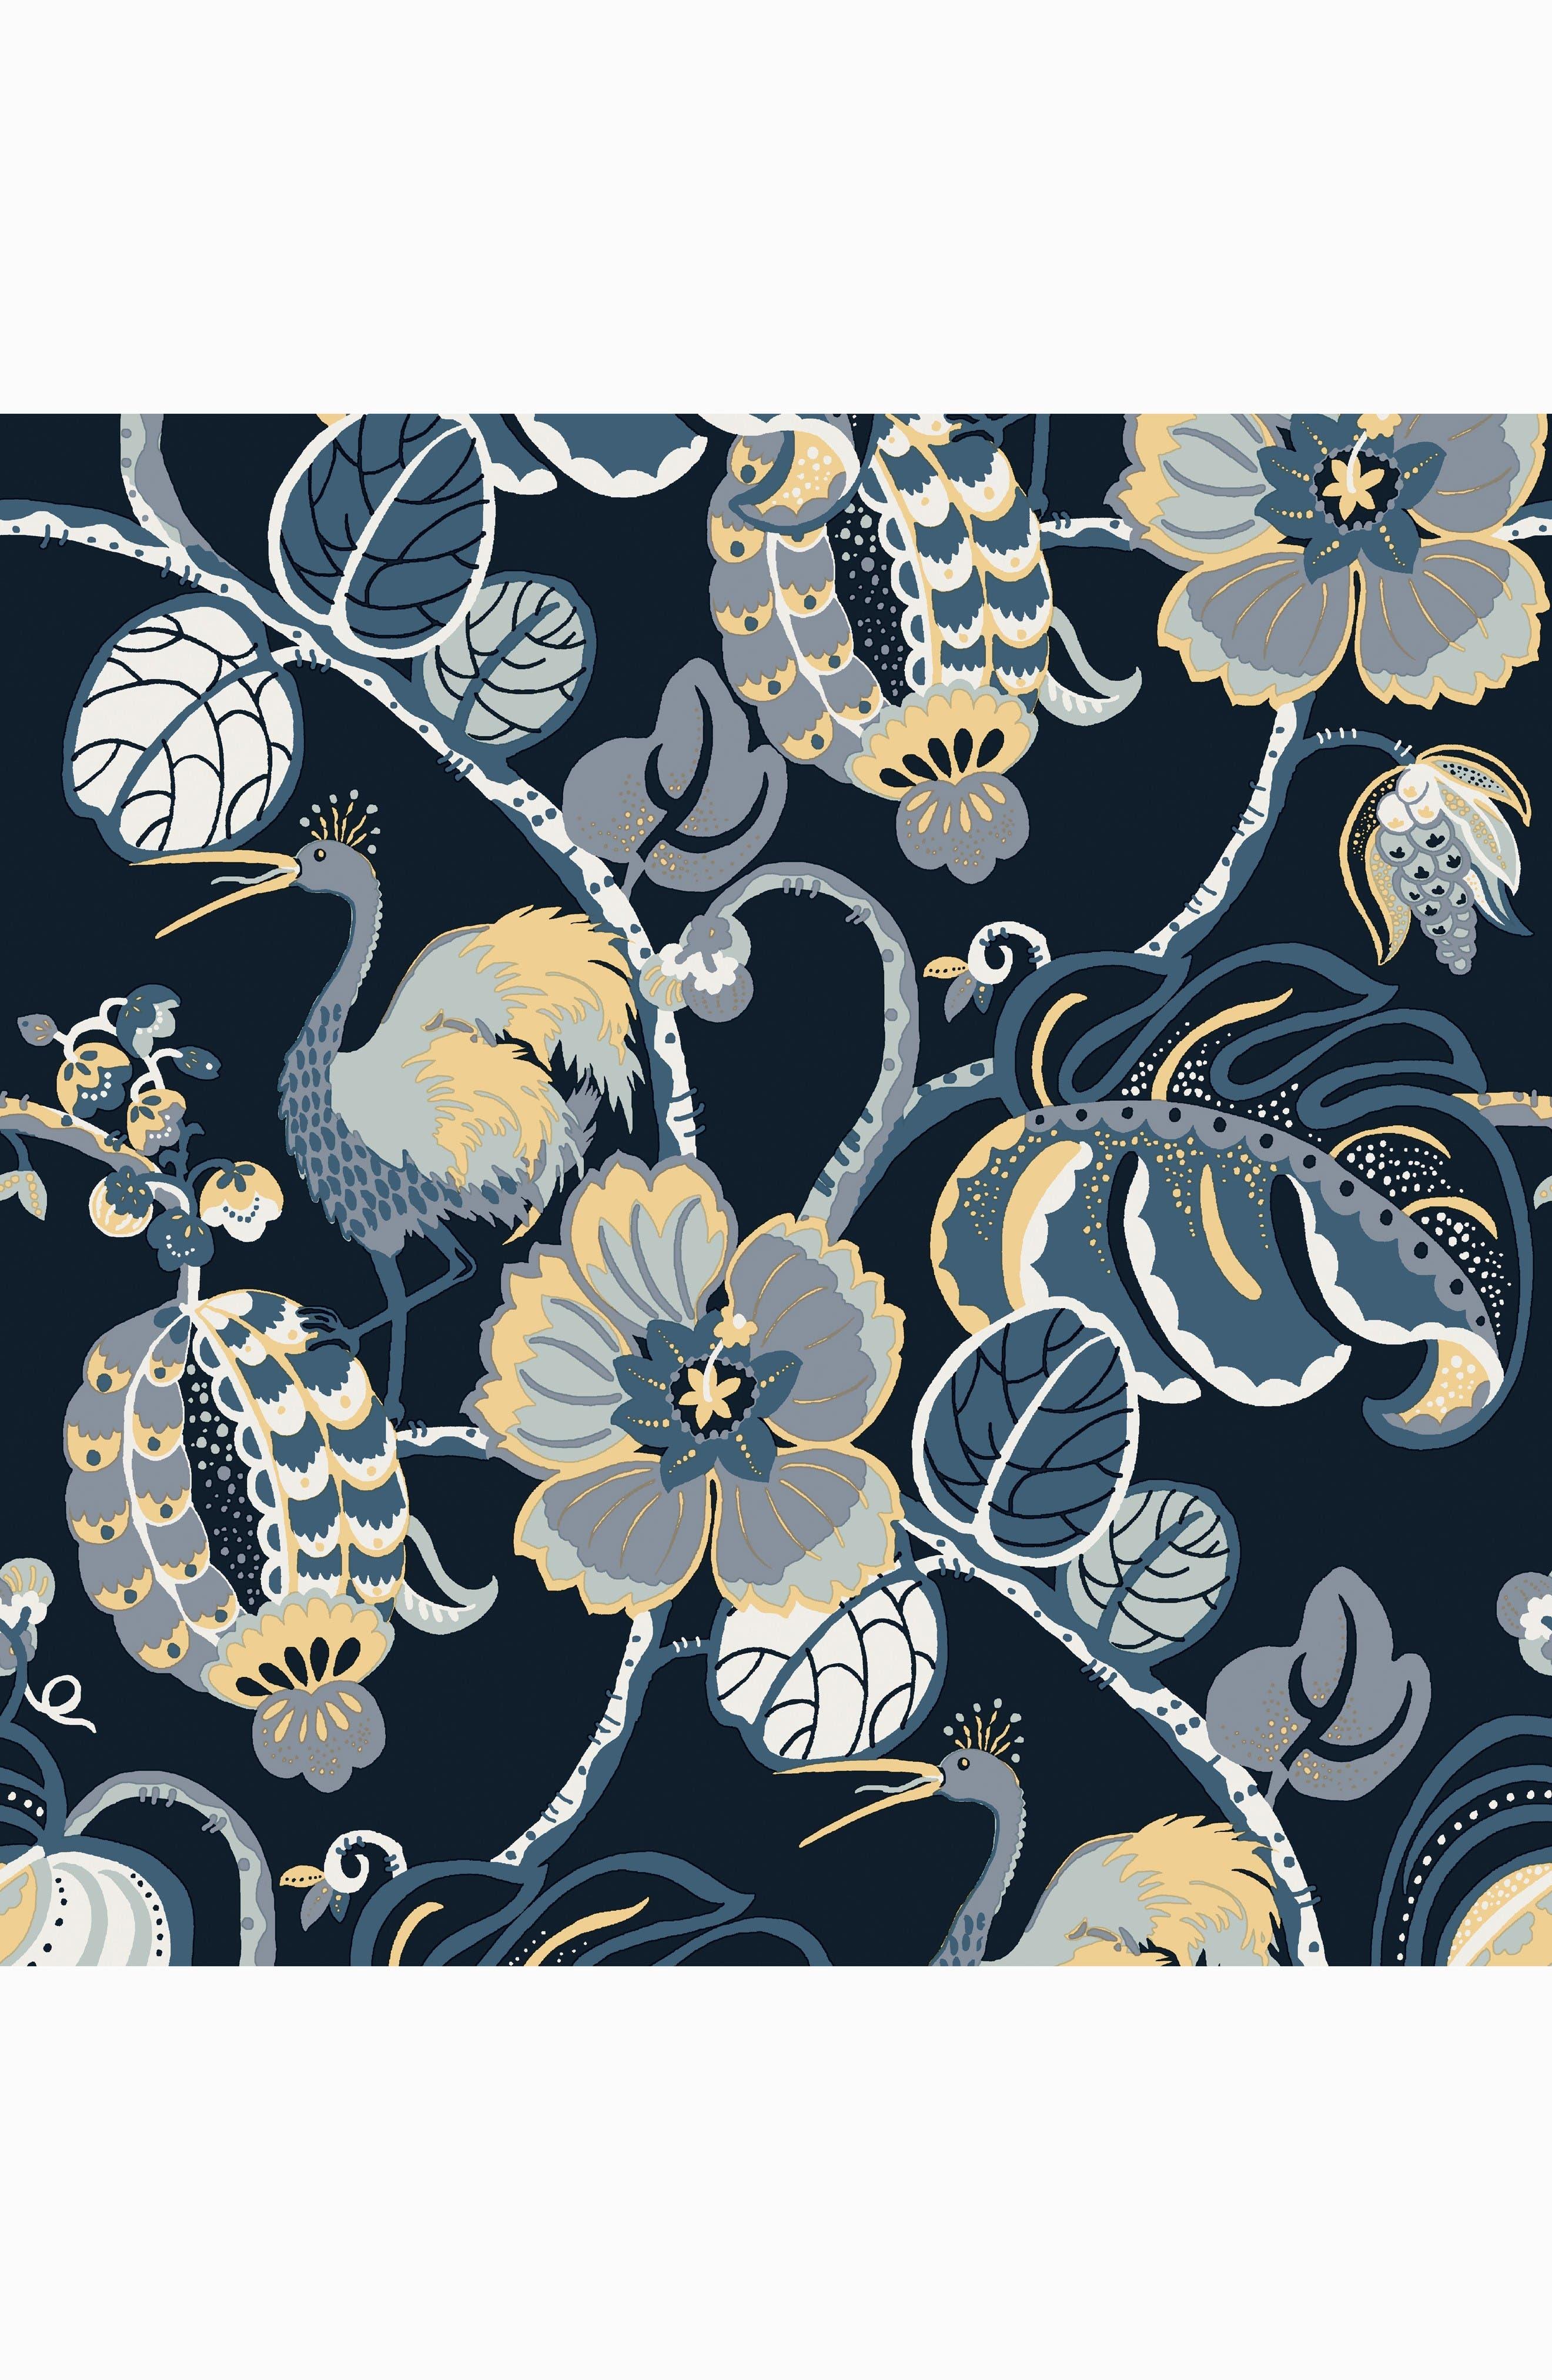 Tropical Fête Self-Adhesive Vinyl Wallpaper,                             Main thumbnail 1, color,                             Azure Blue